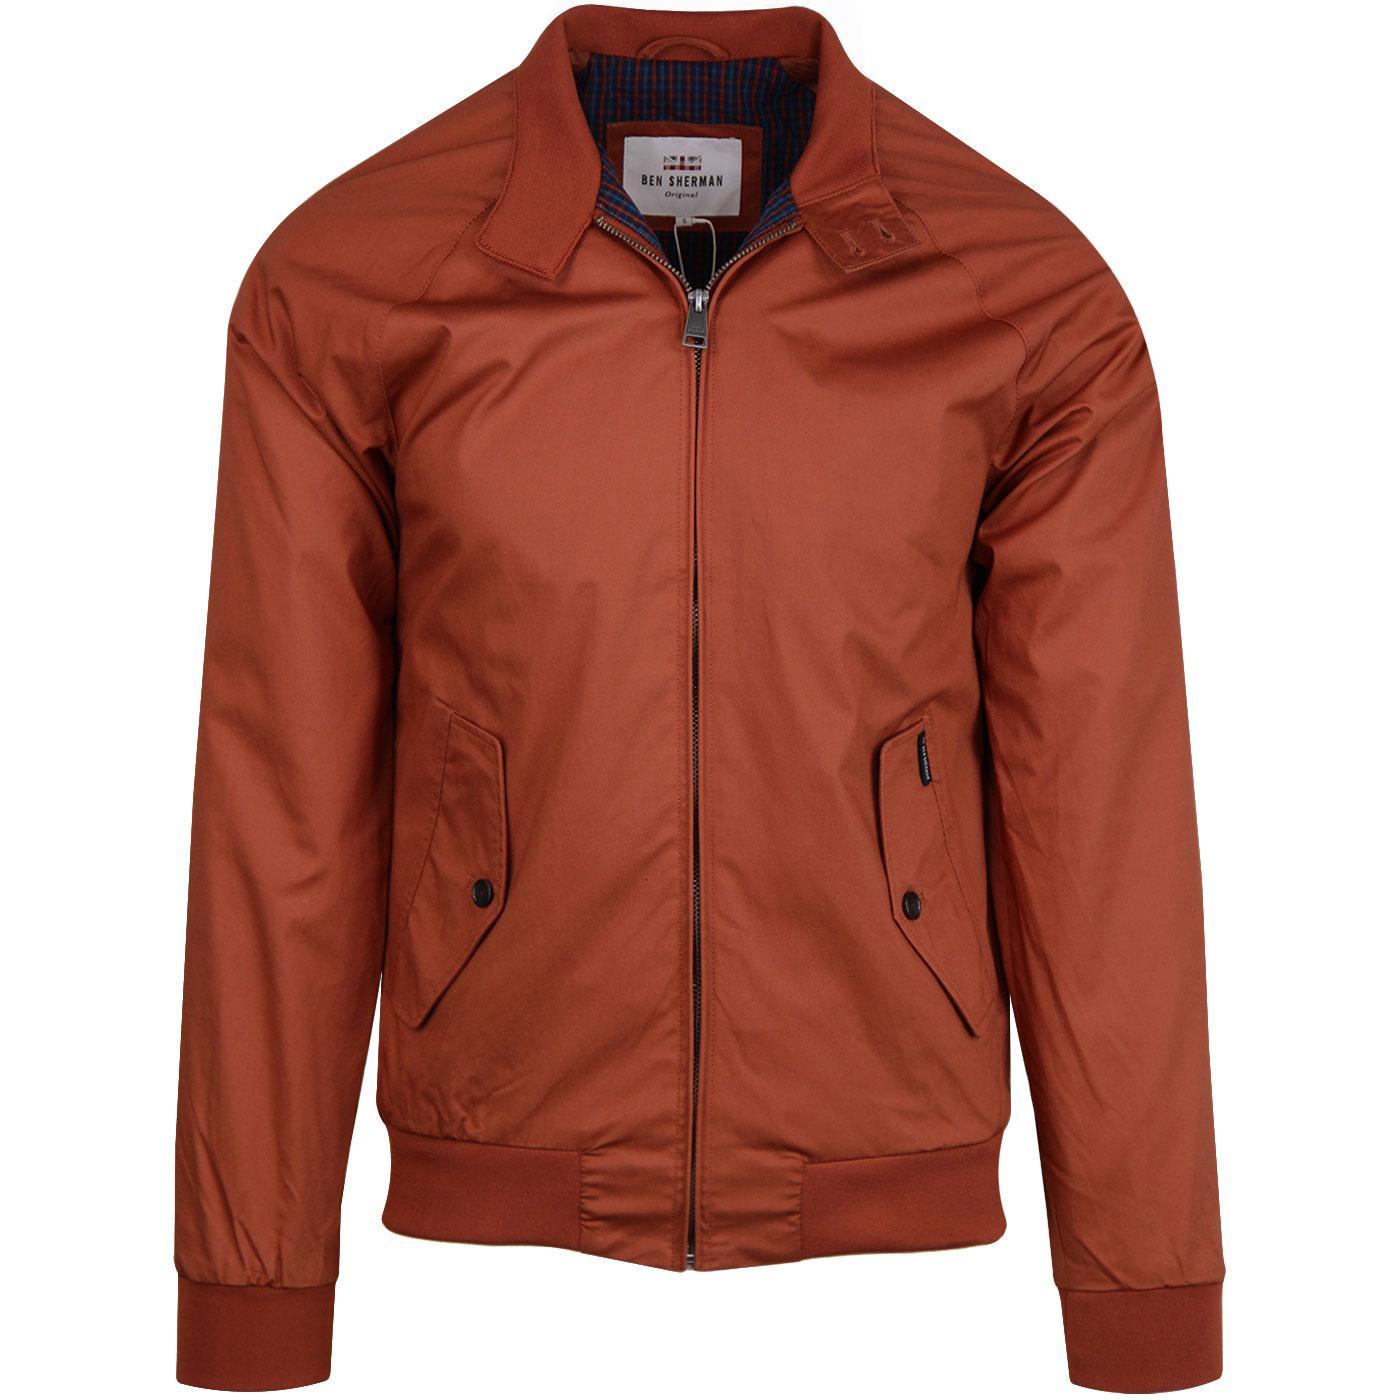 b1cbd8ad3d23 BEN SHERMAN Retro 60s Mod Harrington Jacket in Cinnamon